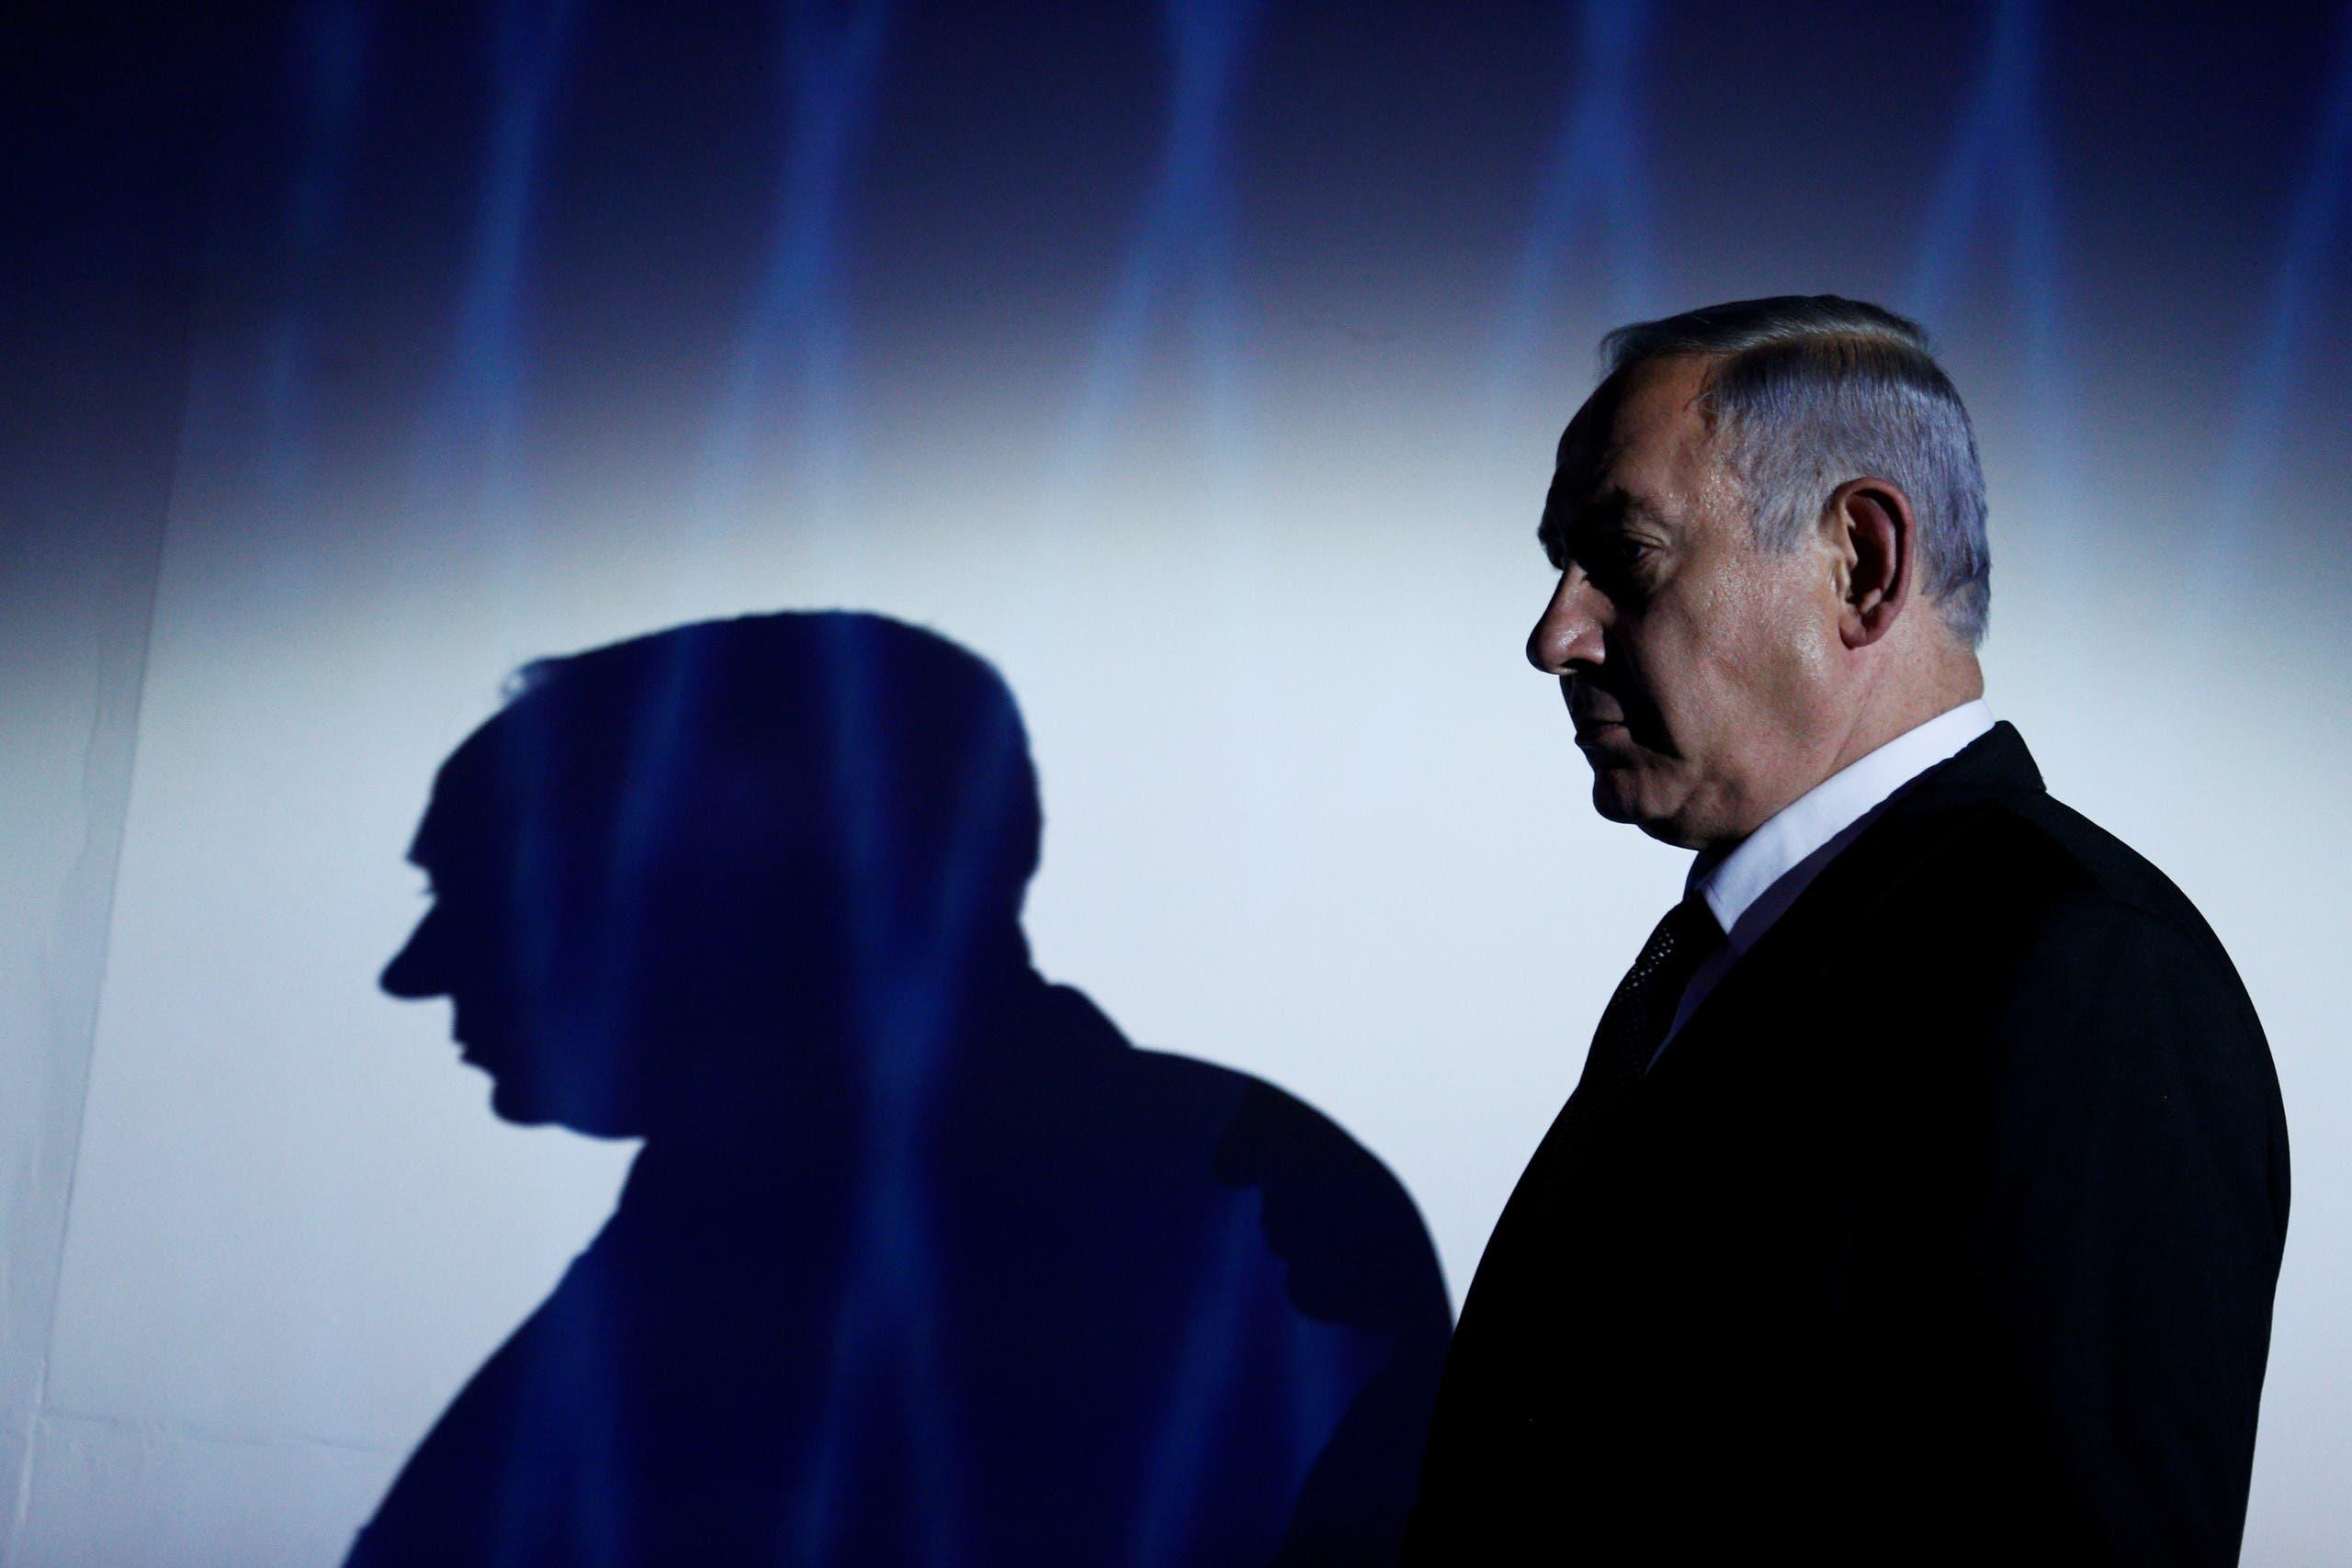 Israeli Prime Minister Benjamin Netanyahu is seen during the the 2016 Genesis Prize award-ceremony in Jerusalem, June 23, 2016. (Reuters)